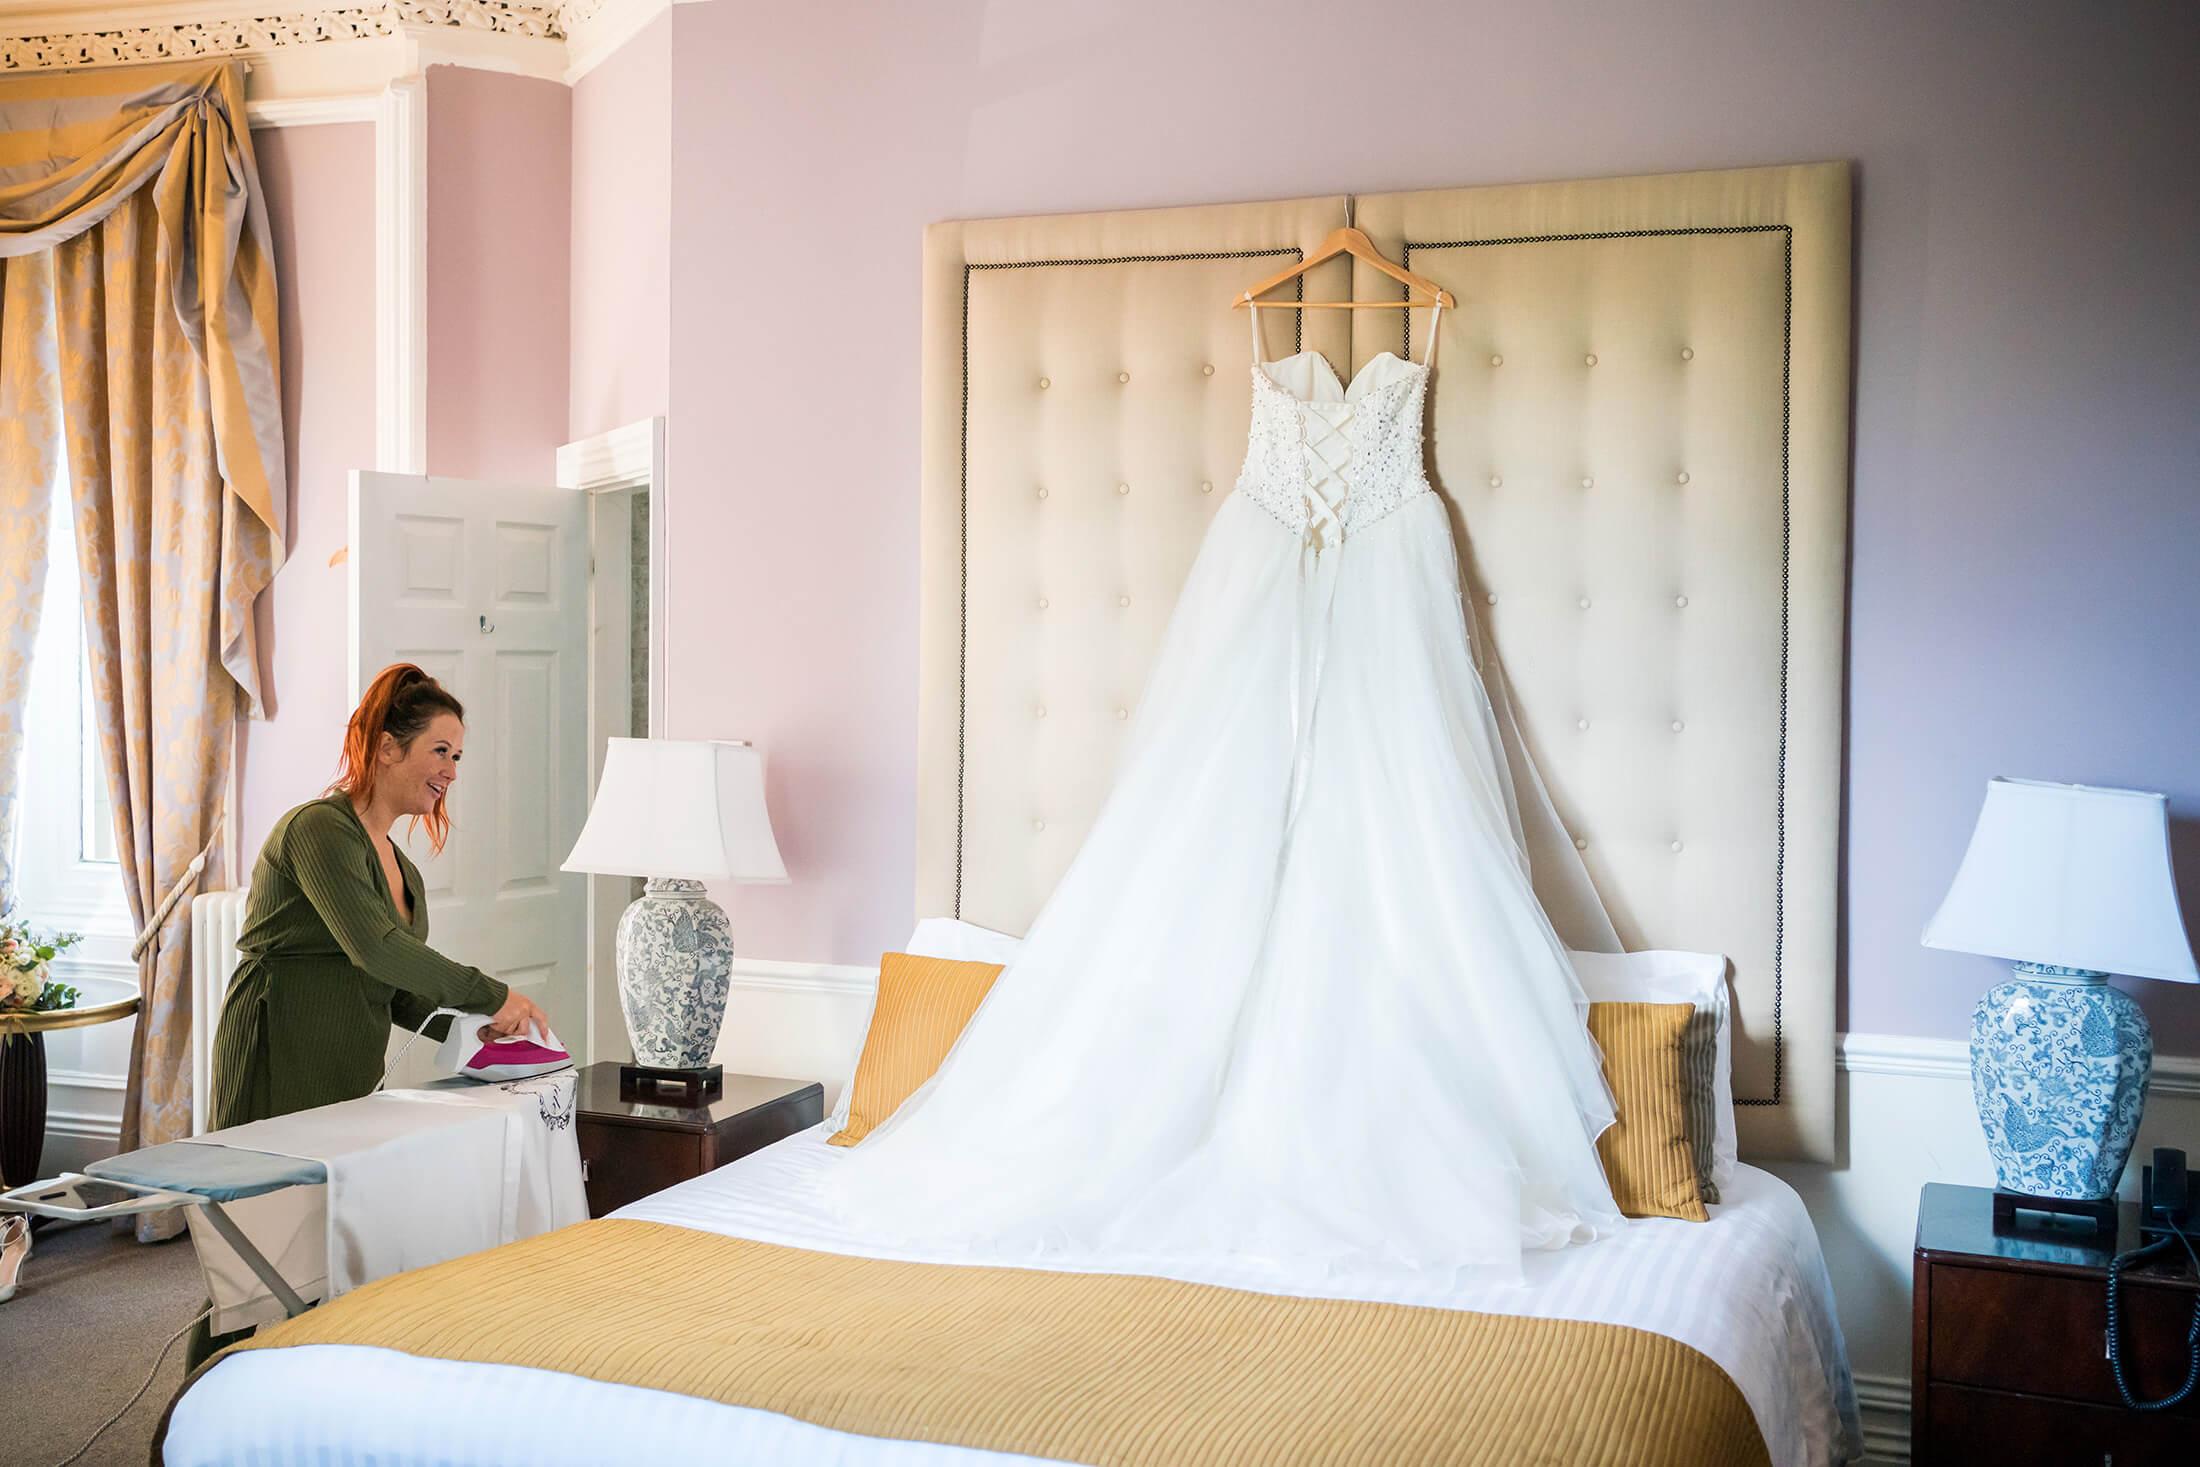 Hollin Hall Hotel Wedding Photographer - The bride irons her veil